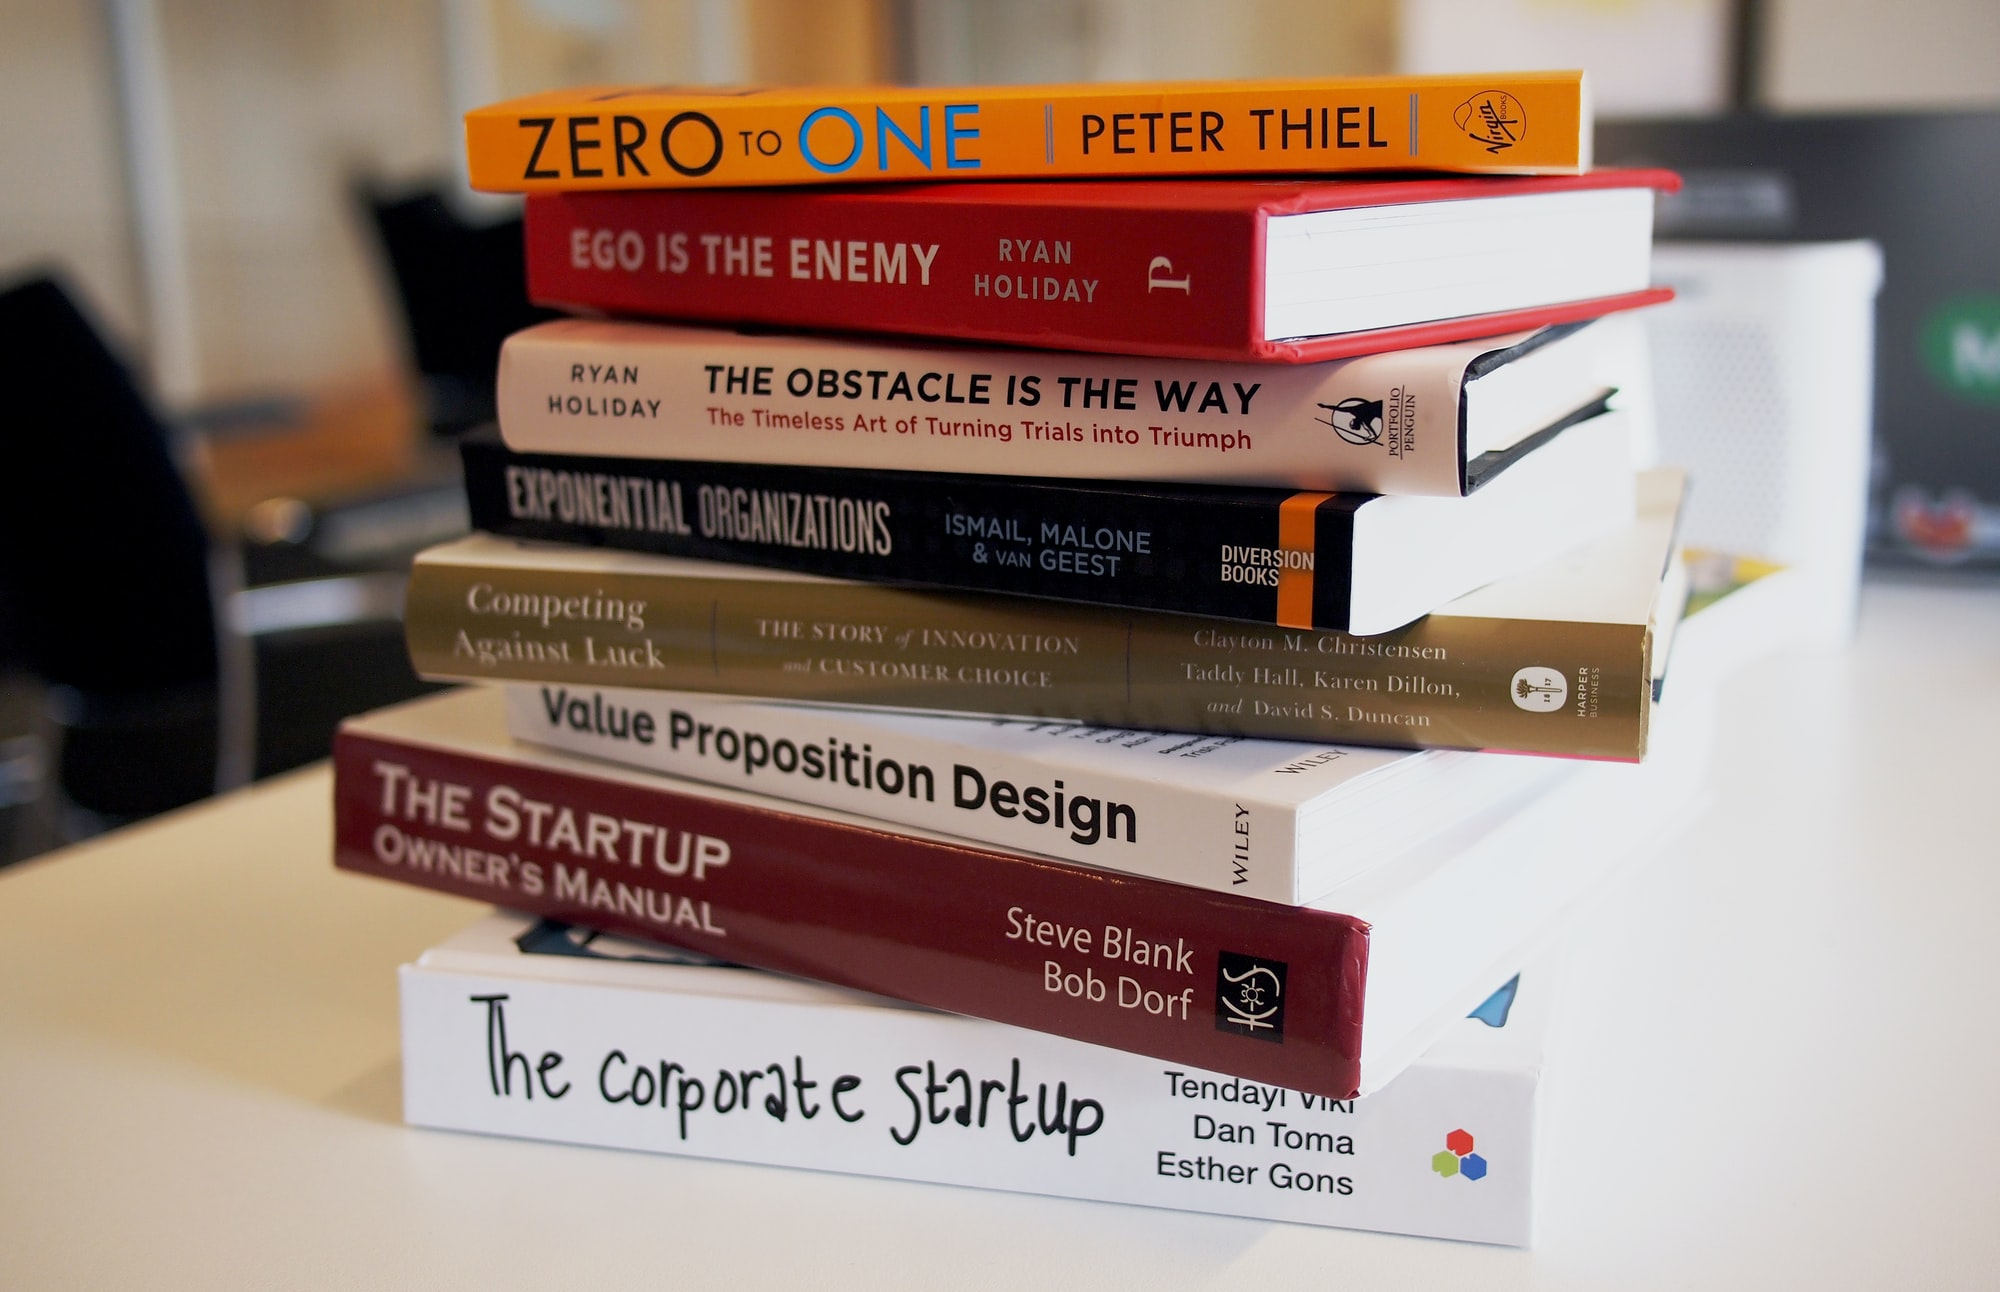 The best startup advice: Create value